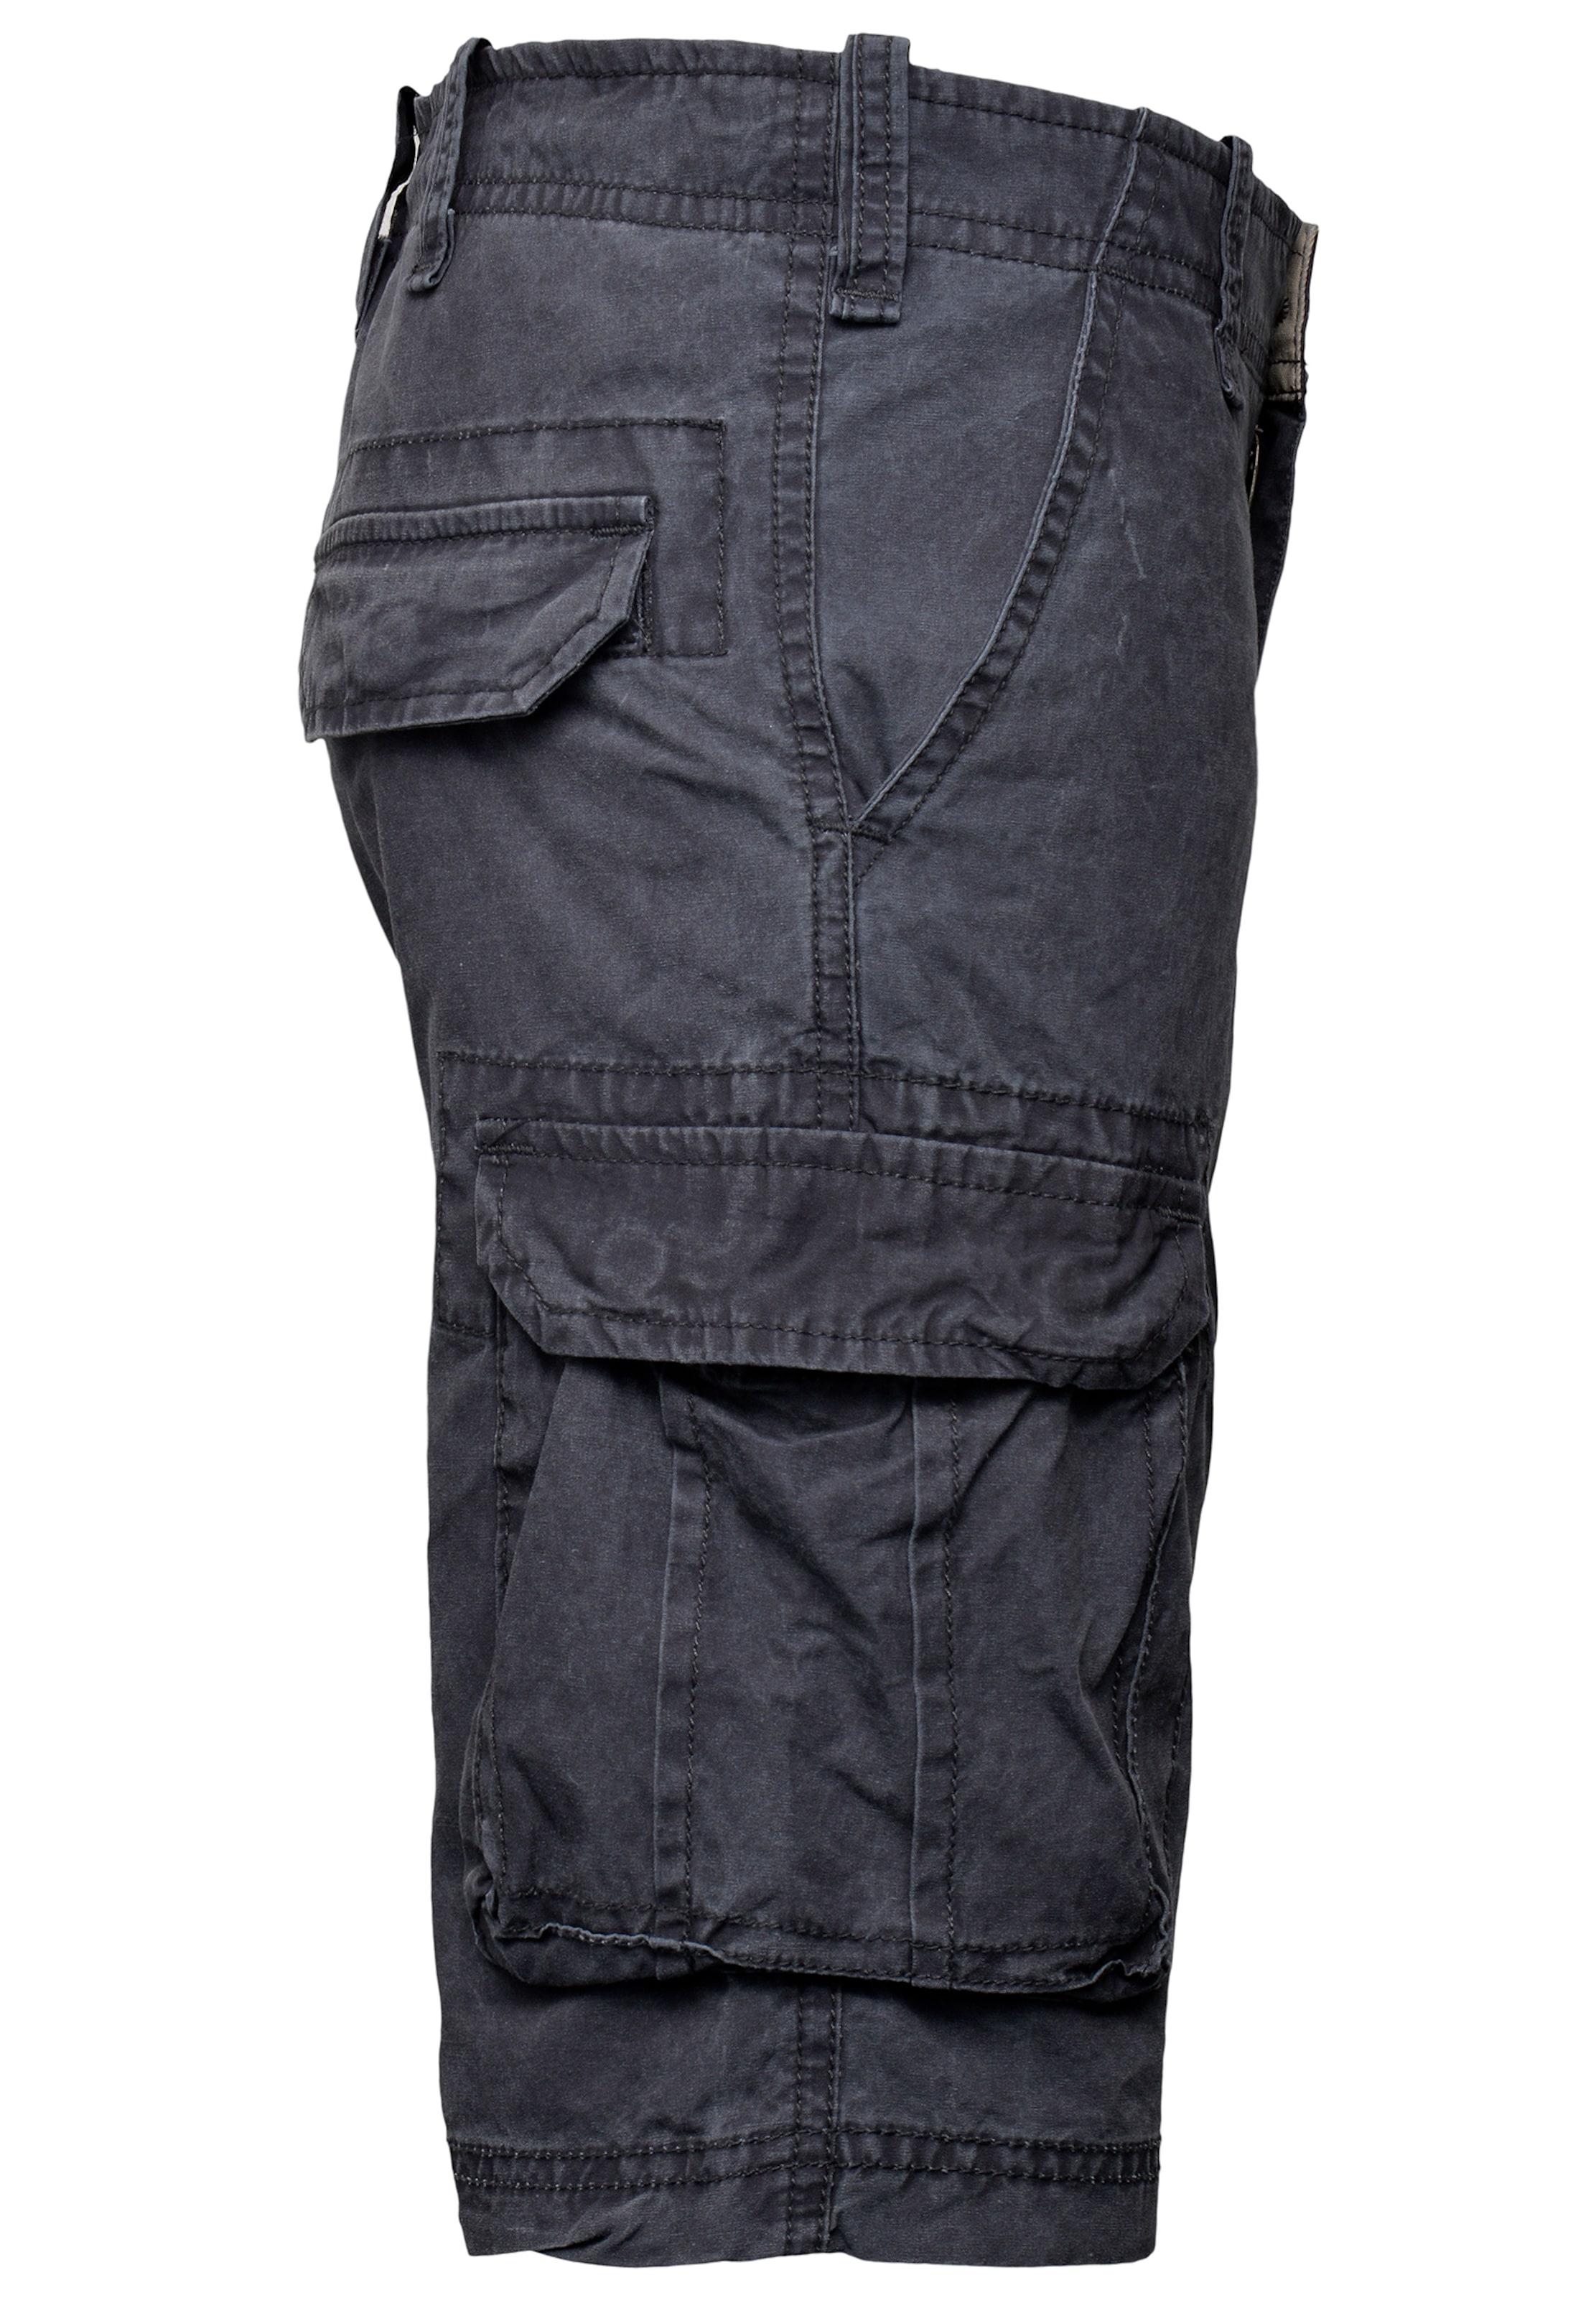 Shorts Code In Anthrazit 'rudder' zero tdxsCrhQ